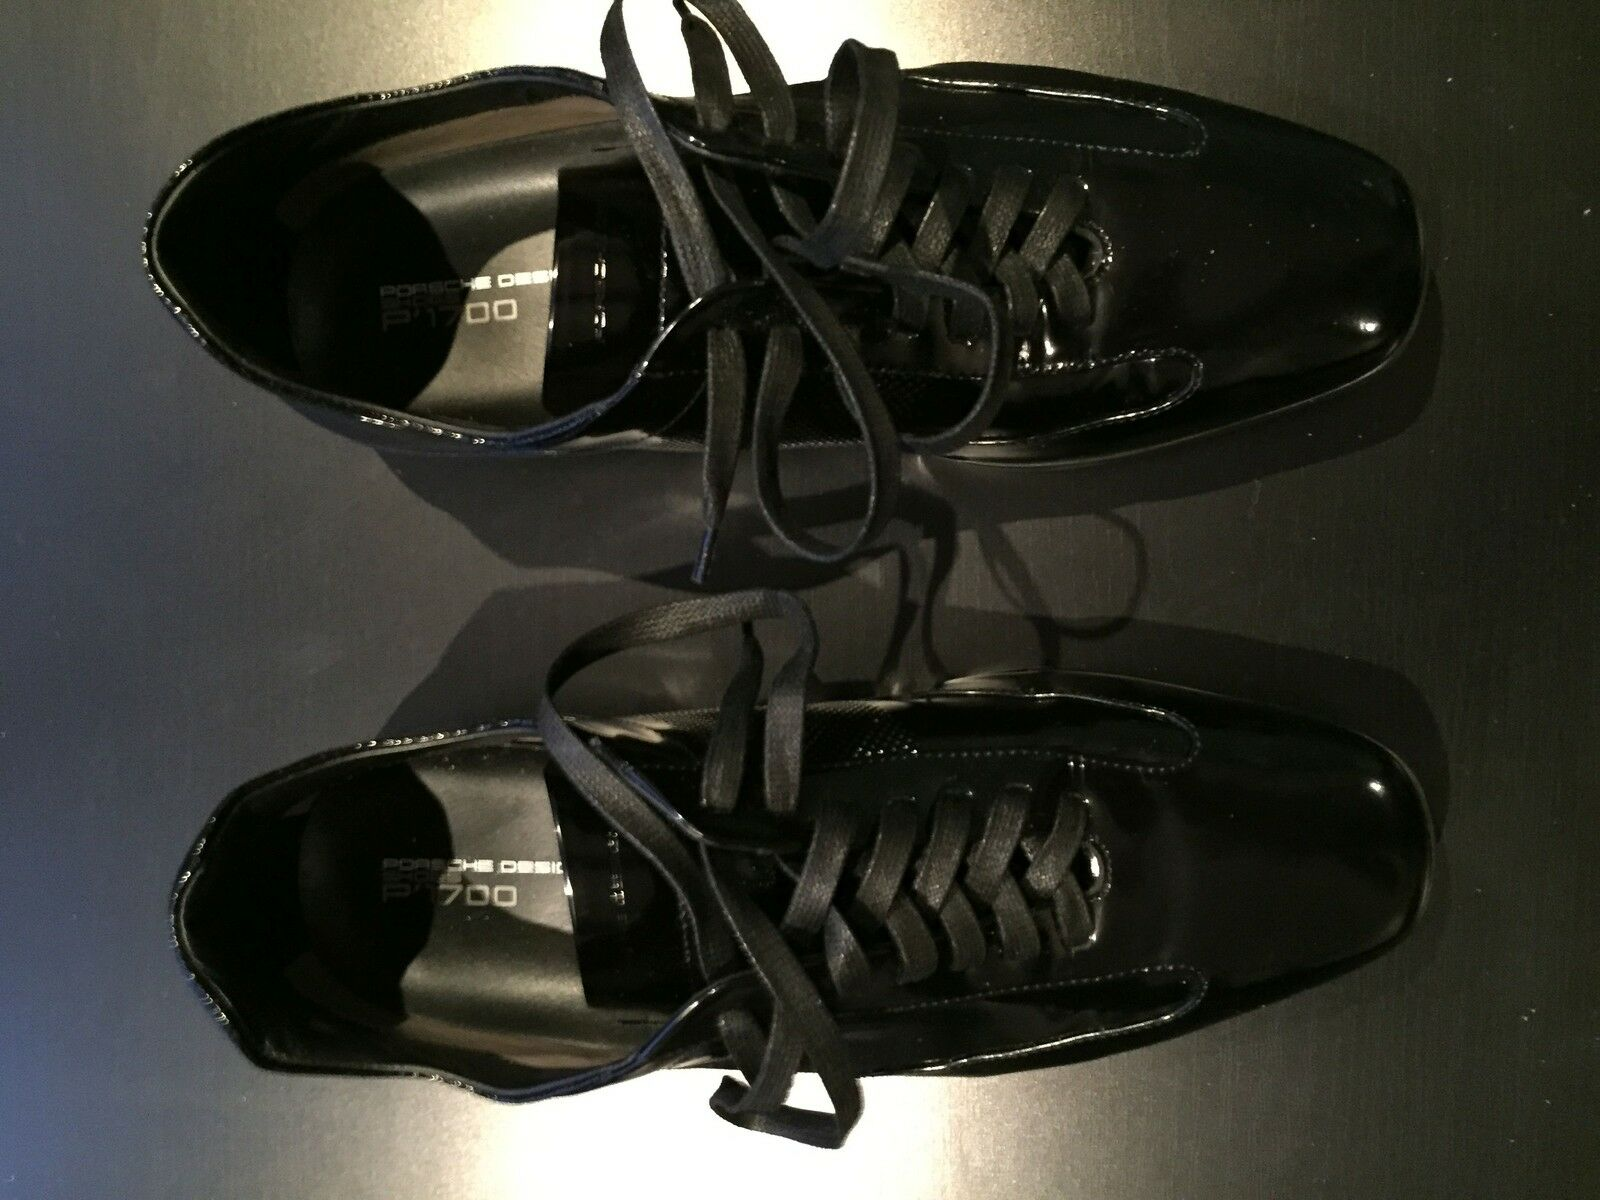 Porsche Design Tokyo L15 P1700 Black Leather shoes EU40 Made in  NEW